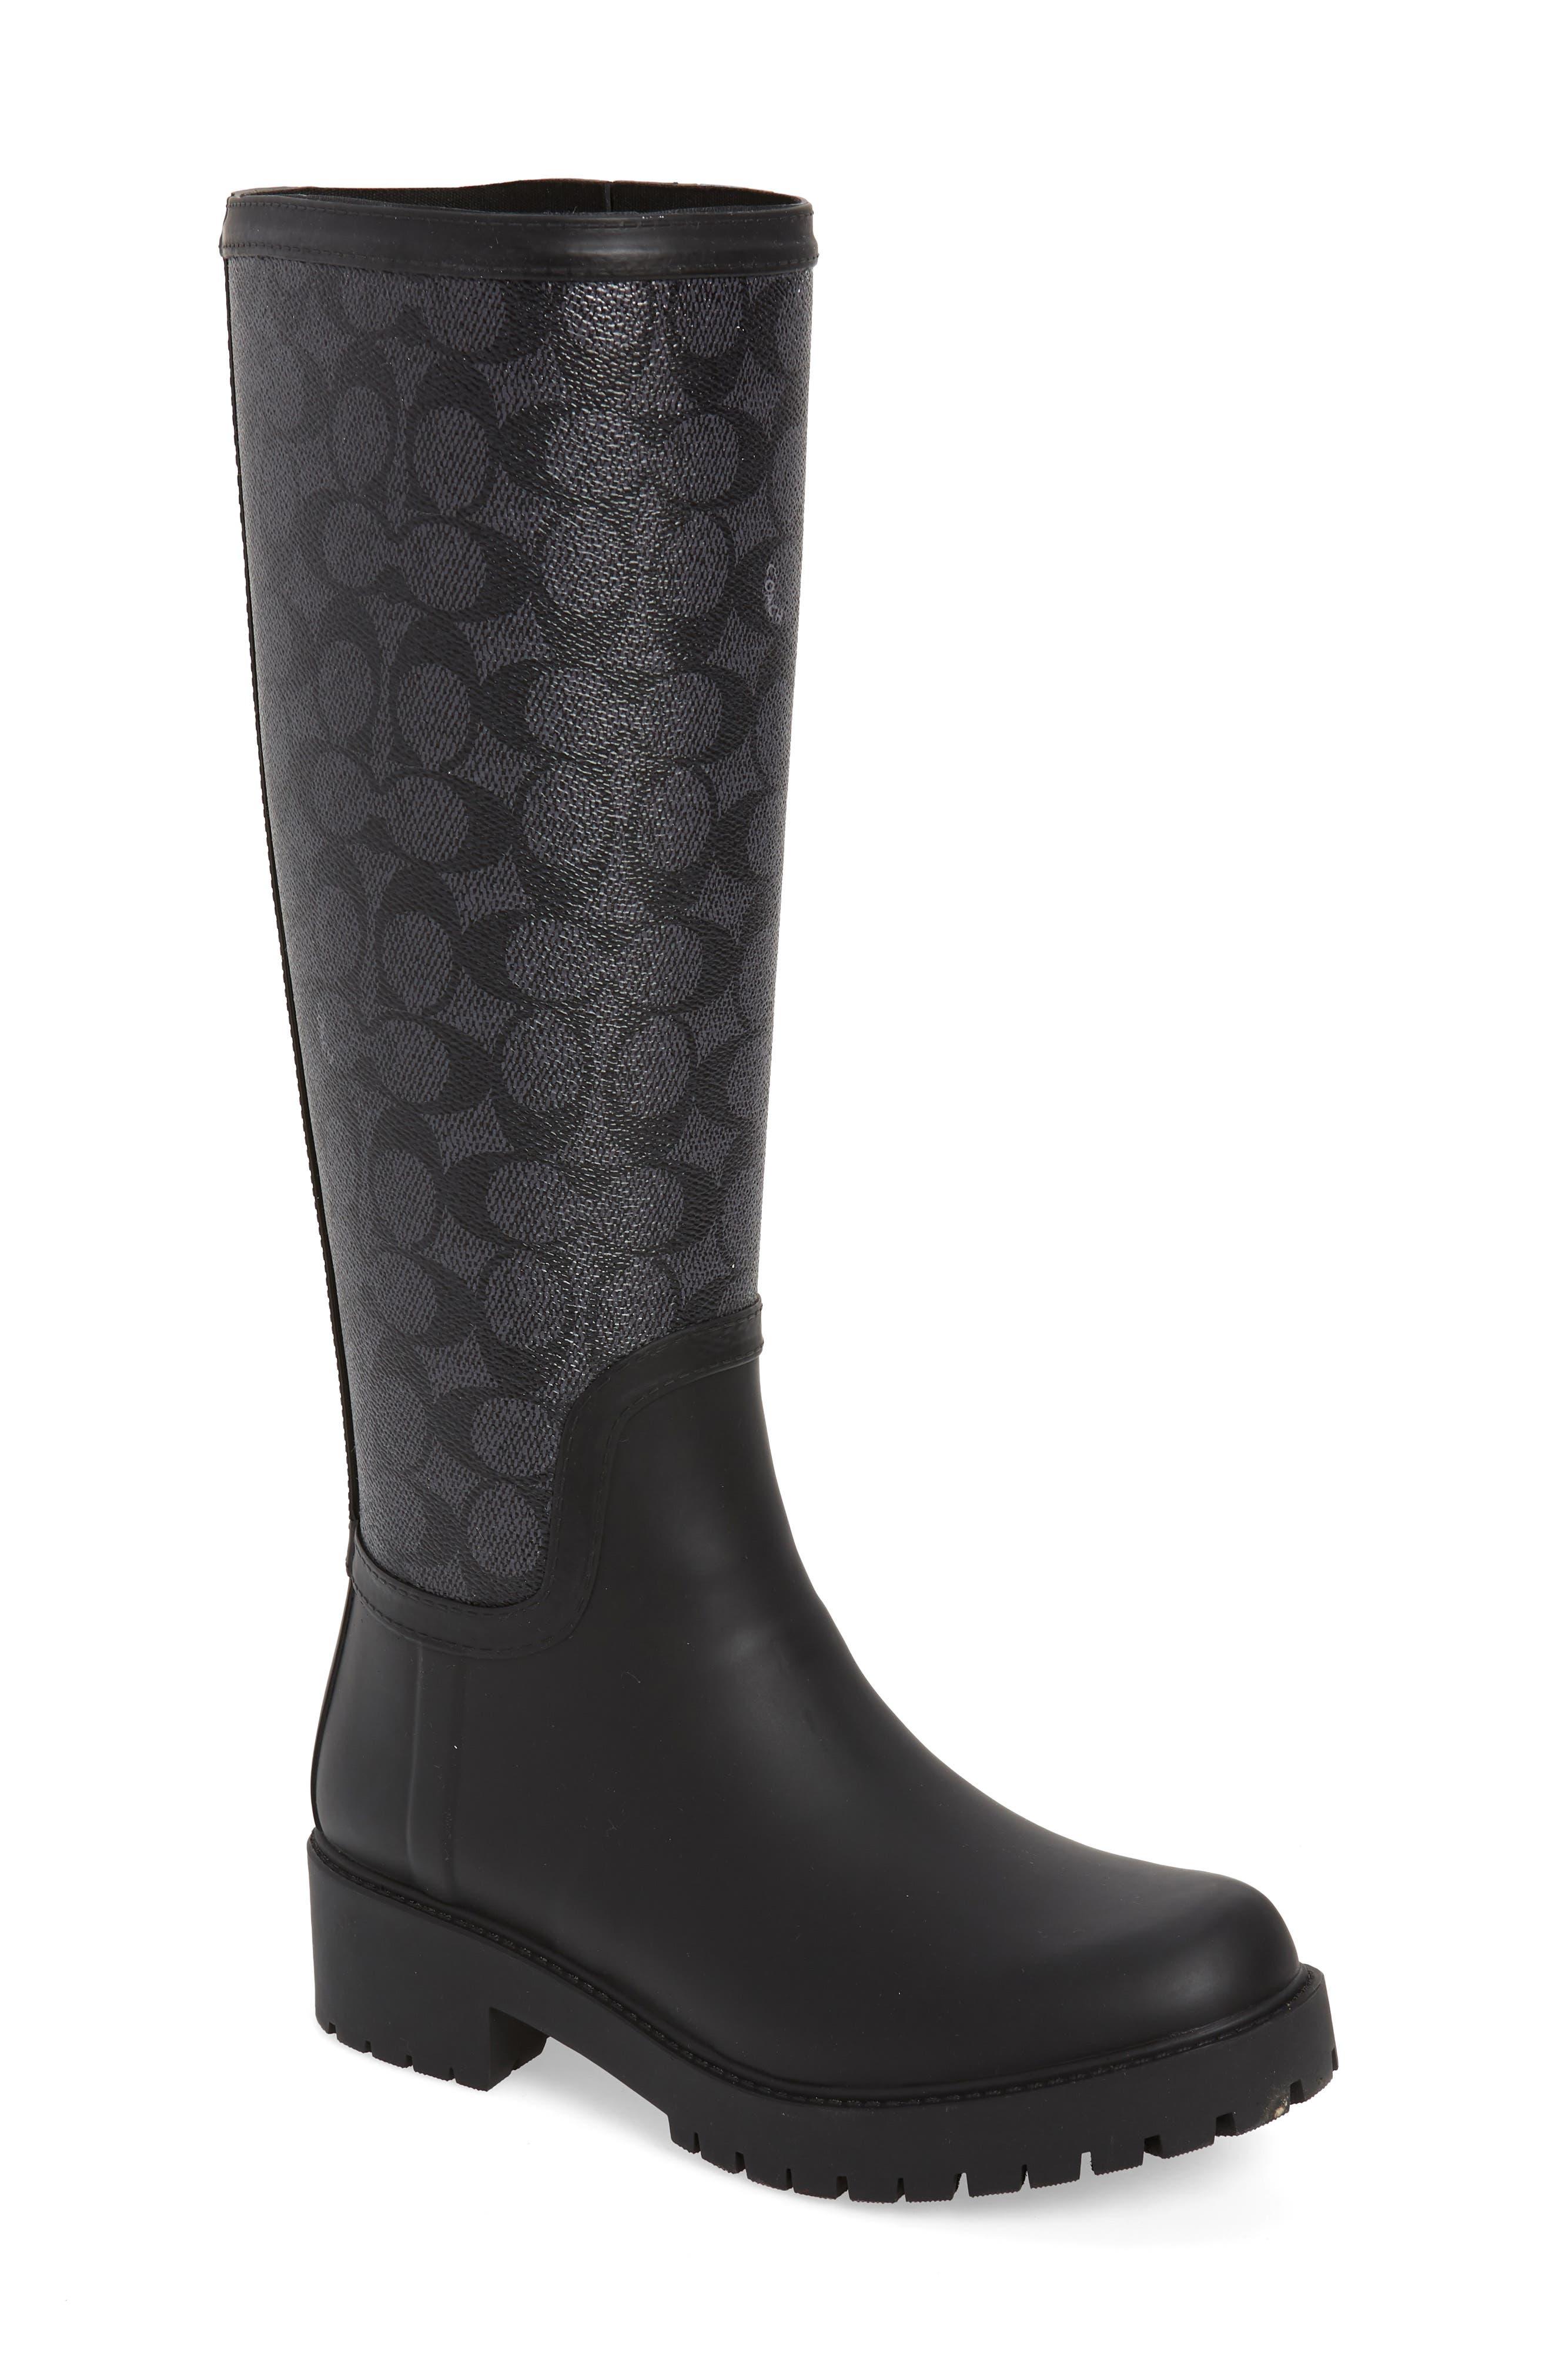 Coach Signature Logo & Floral Knee High Rain Boot, Black